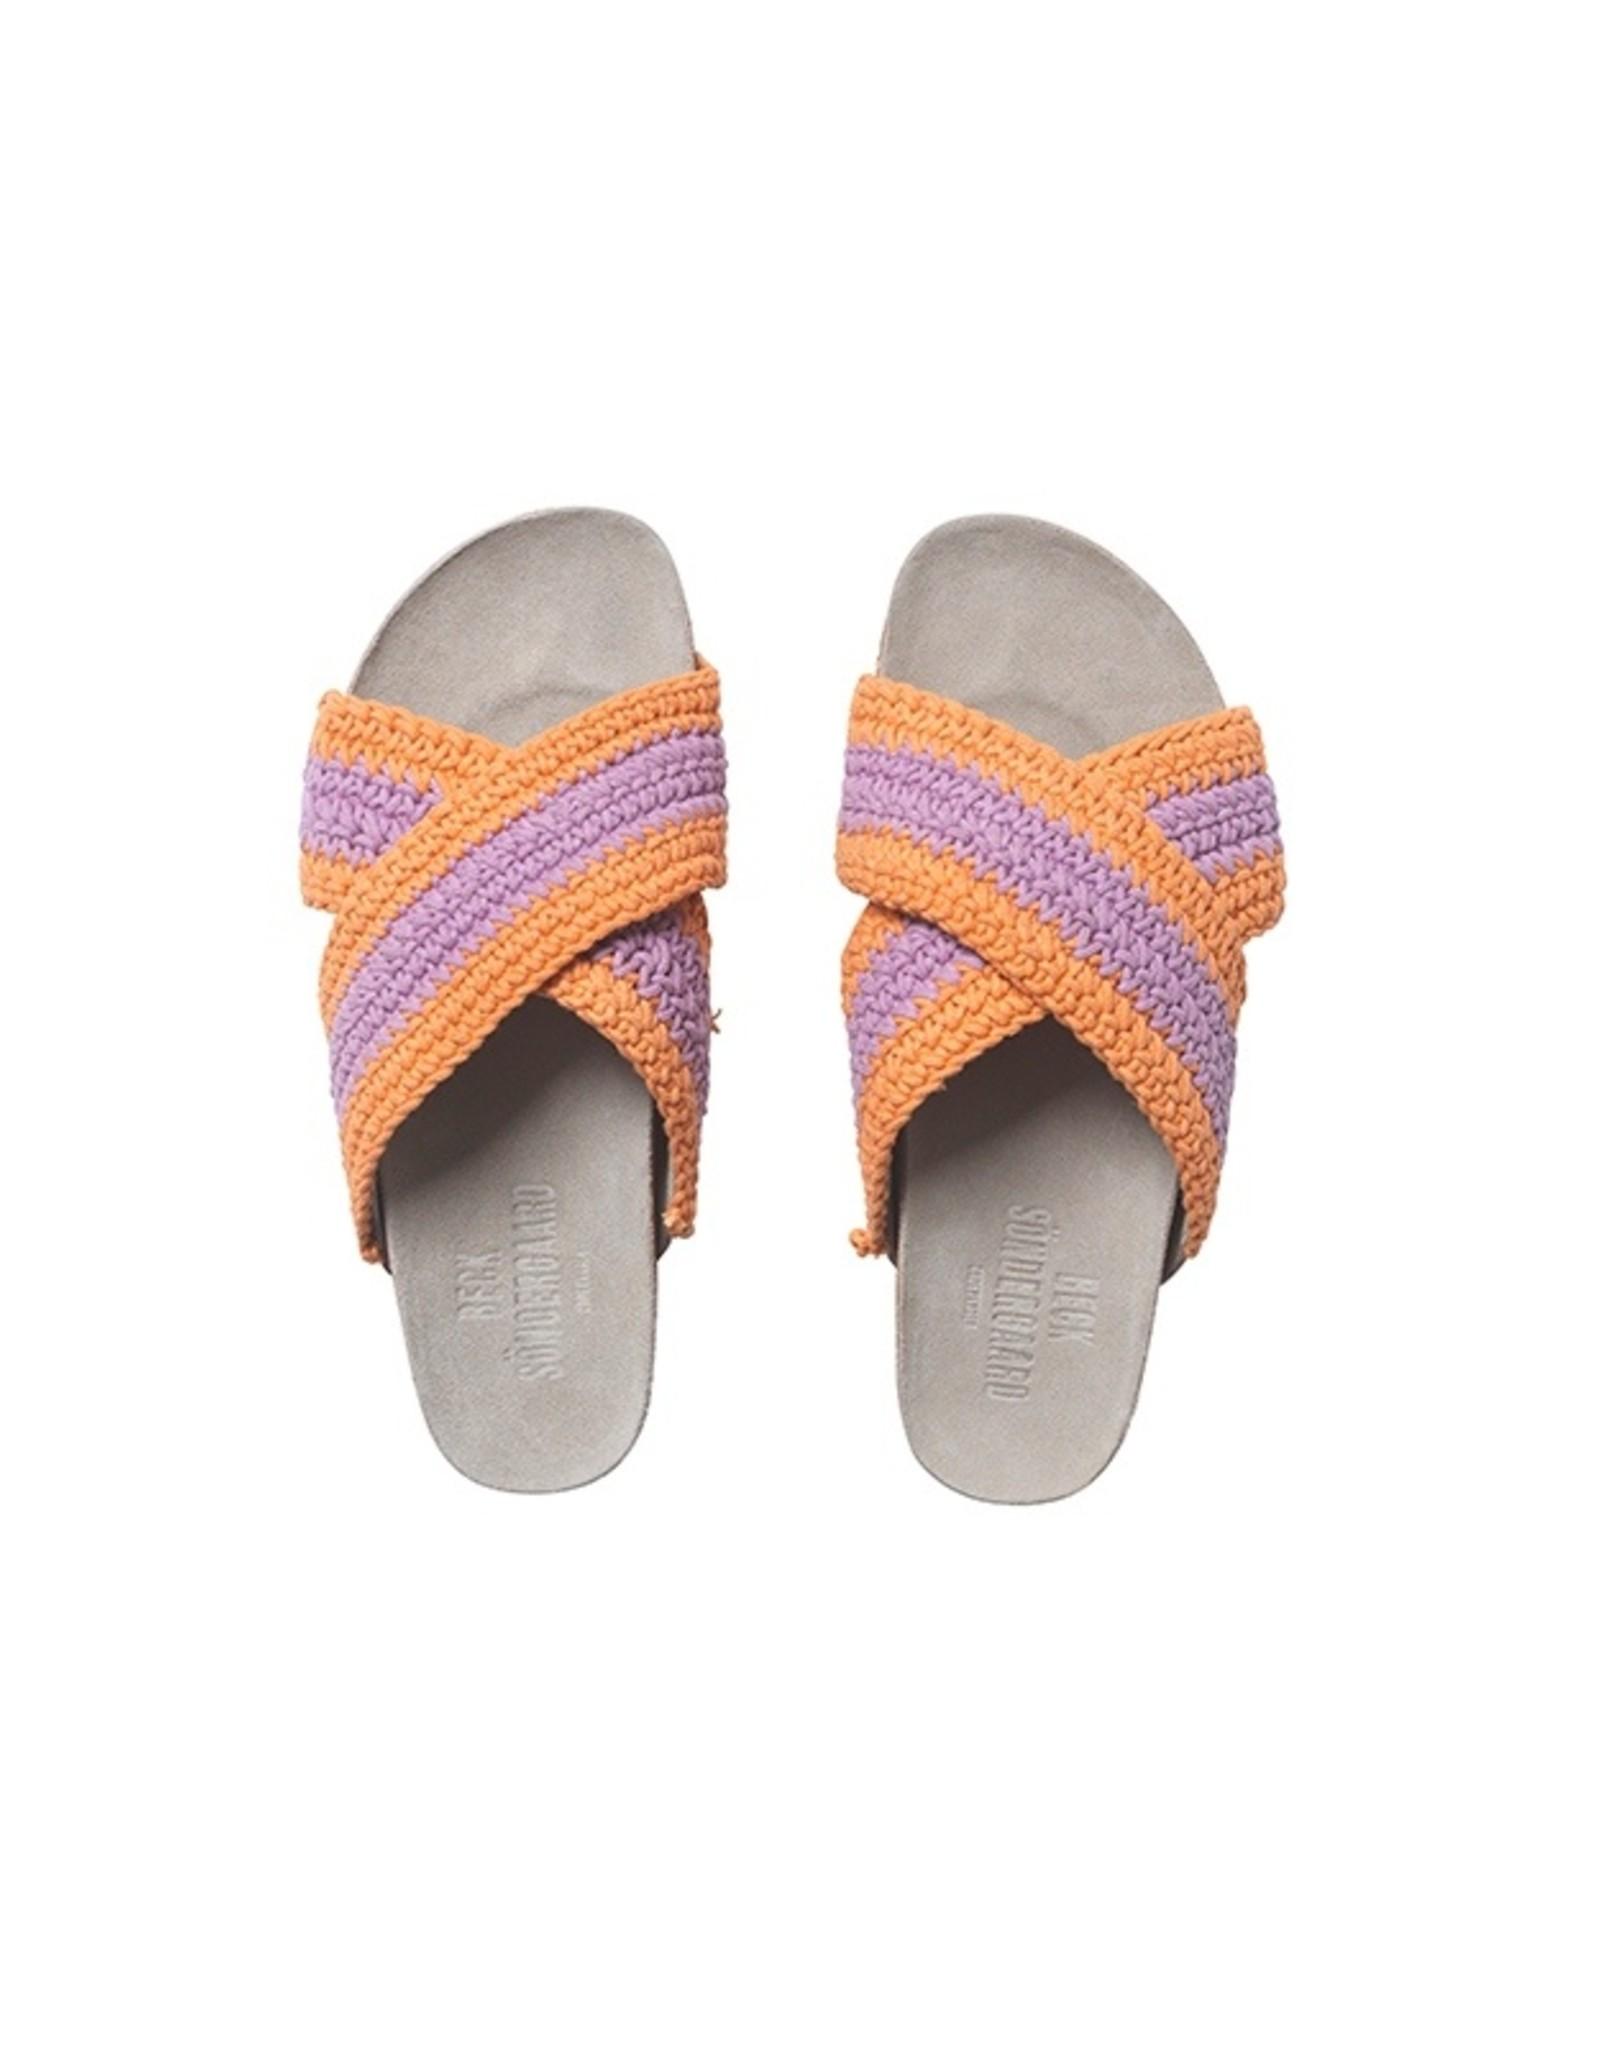 Becksöndergaard Slippers 'Yvonne Crochet' - Lilac - Becksöndergaard